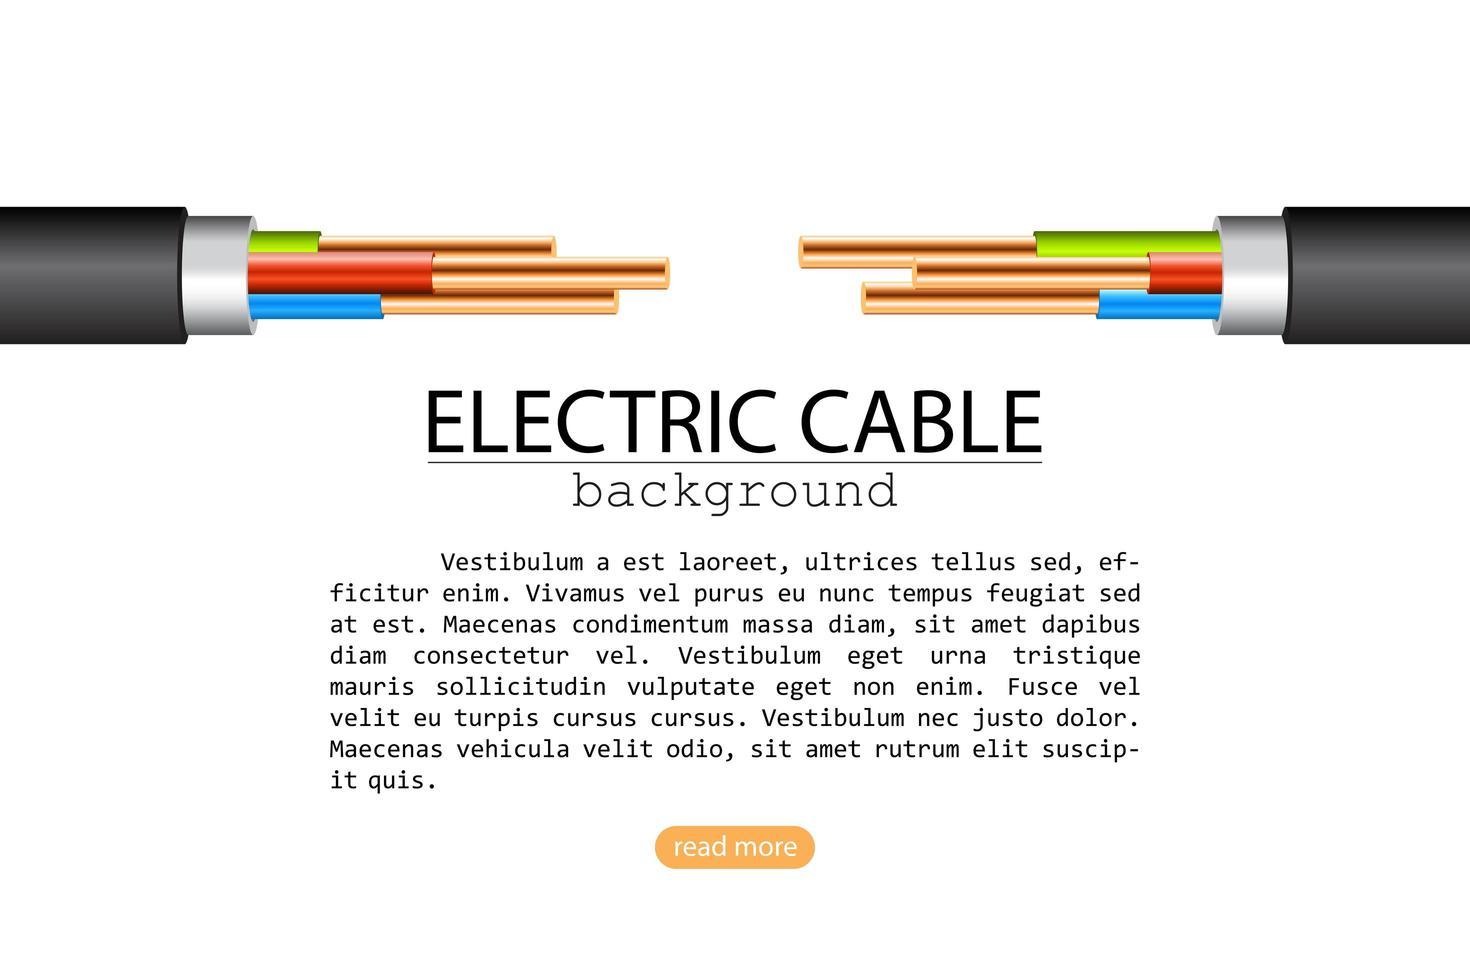 dois cabos elétricos isolados no branco vetor